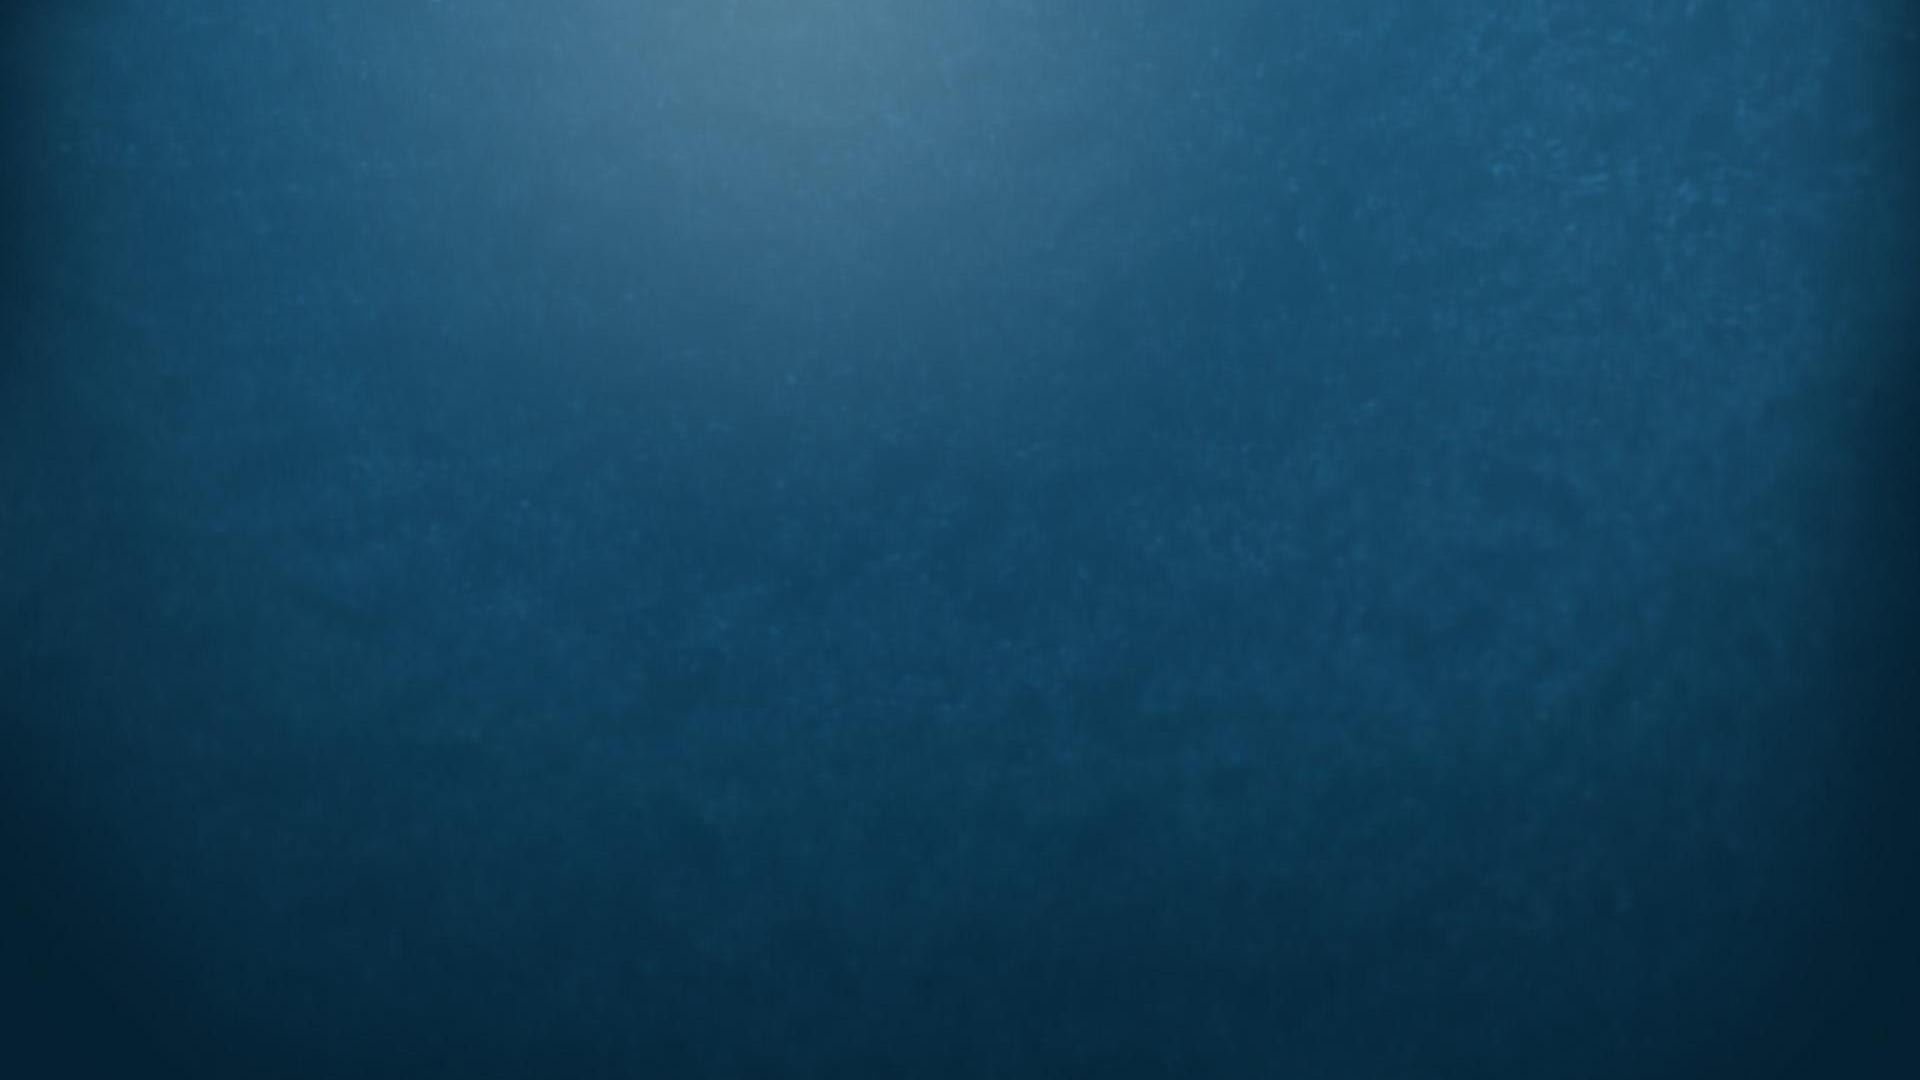 1920x1080 Abstract Blue Gradient Desktop Wallpaper Blue Wallpapers 1920x1080